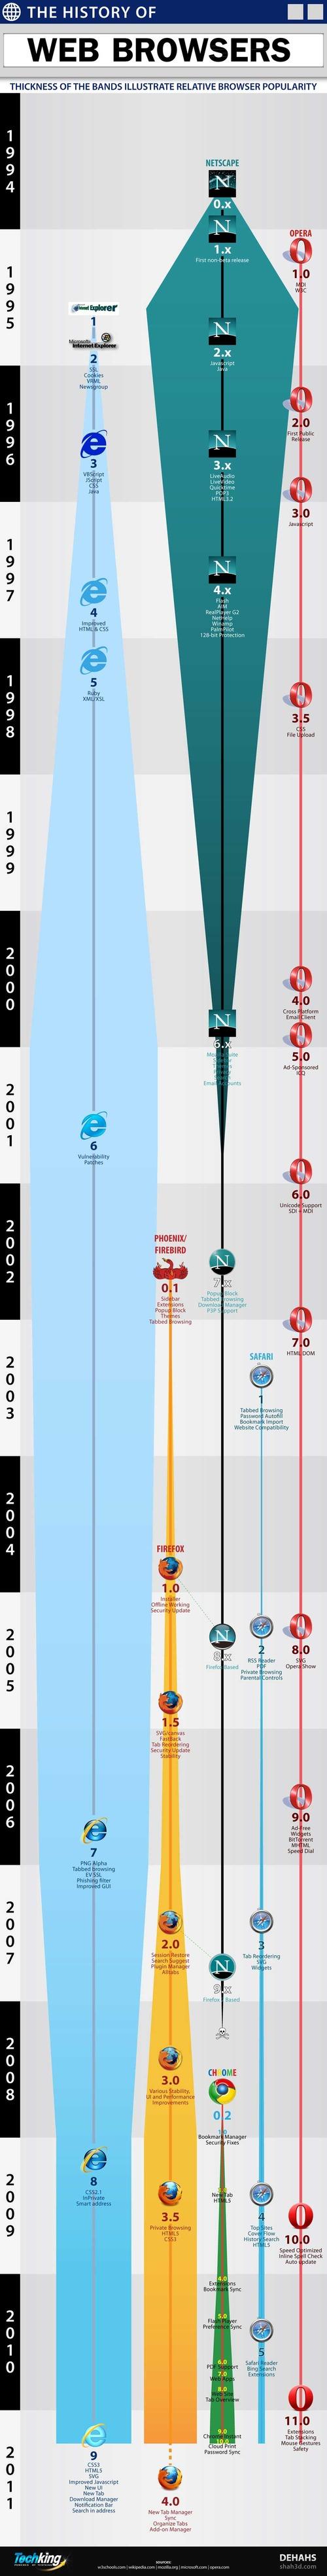 Documental La Verdadera Historia de Internet por Discovery Channel parte I 3